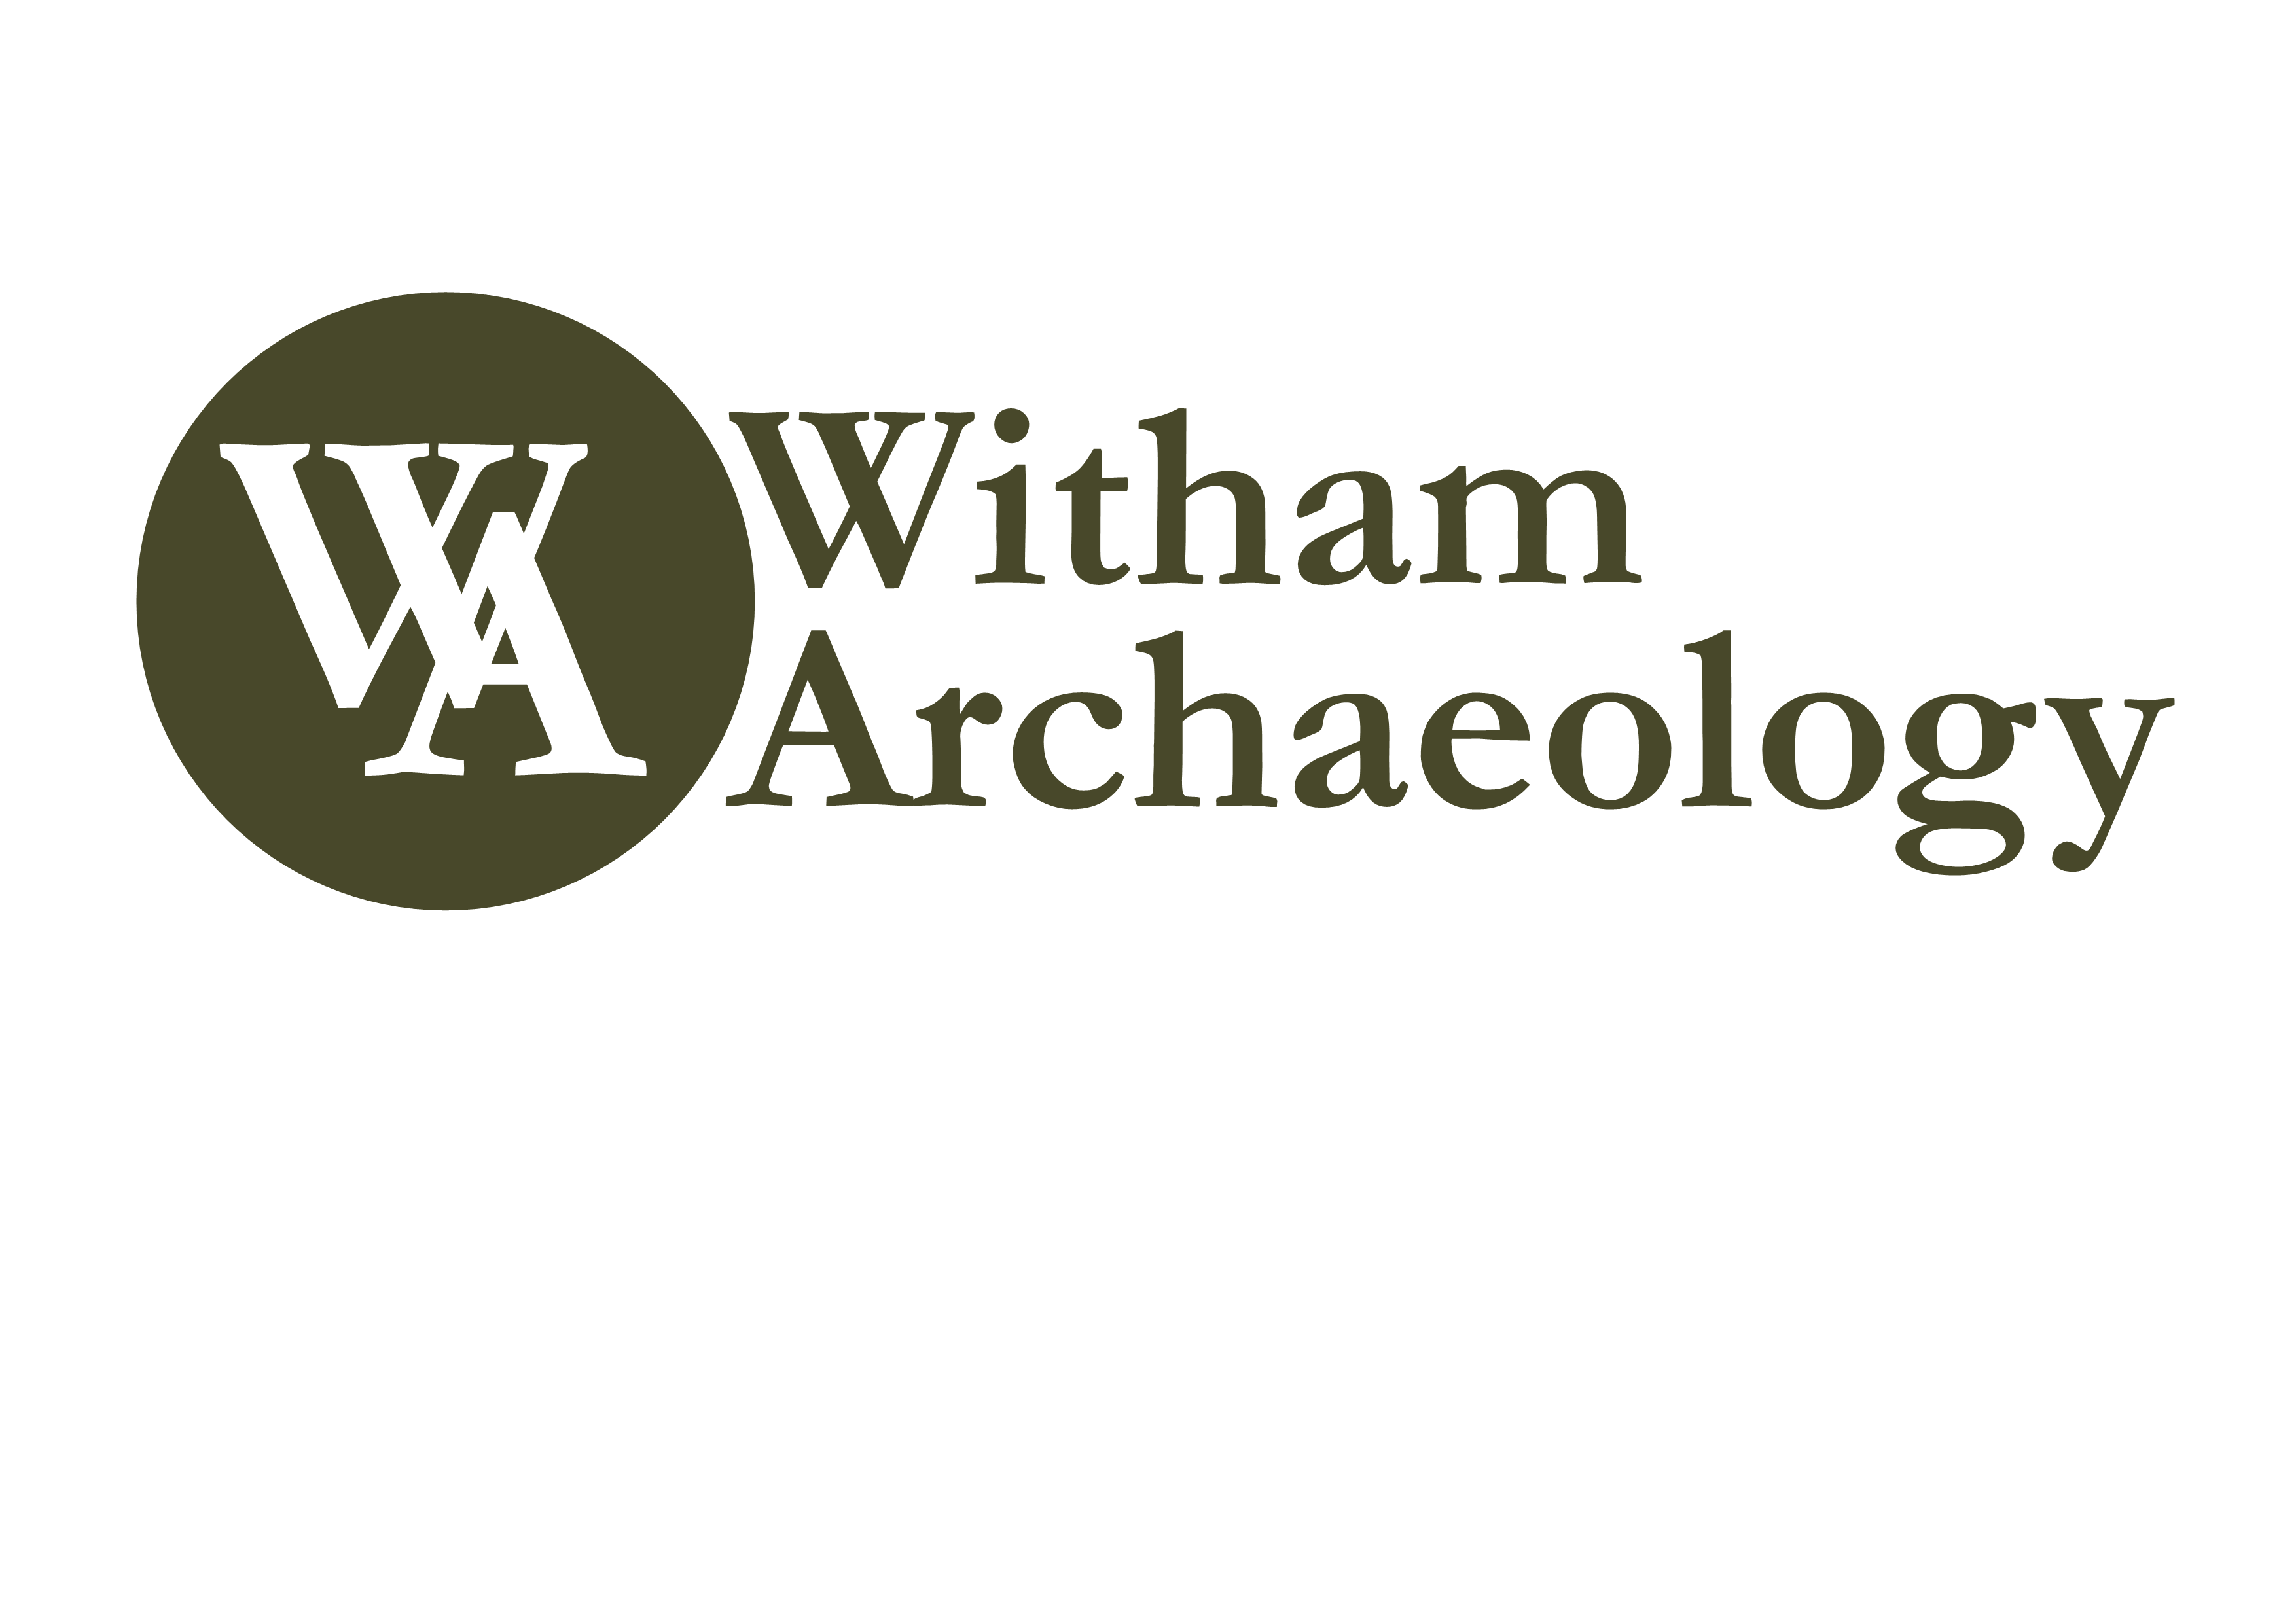 Witham Archaeology Ltd